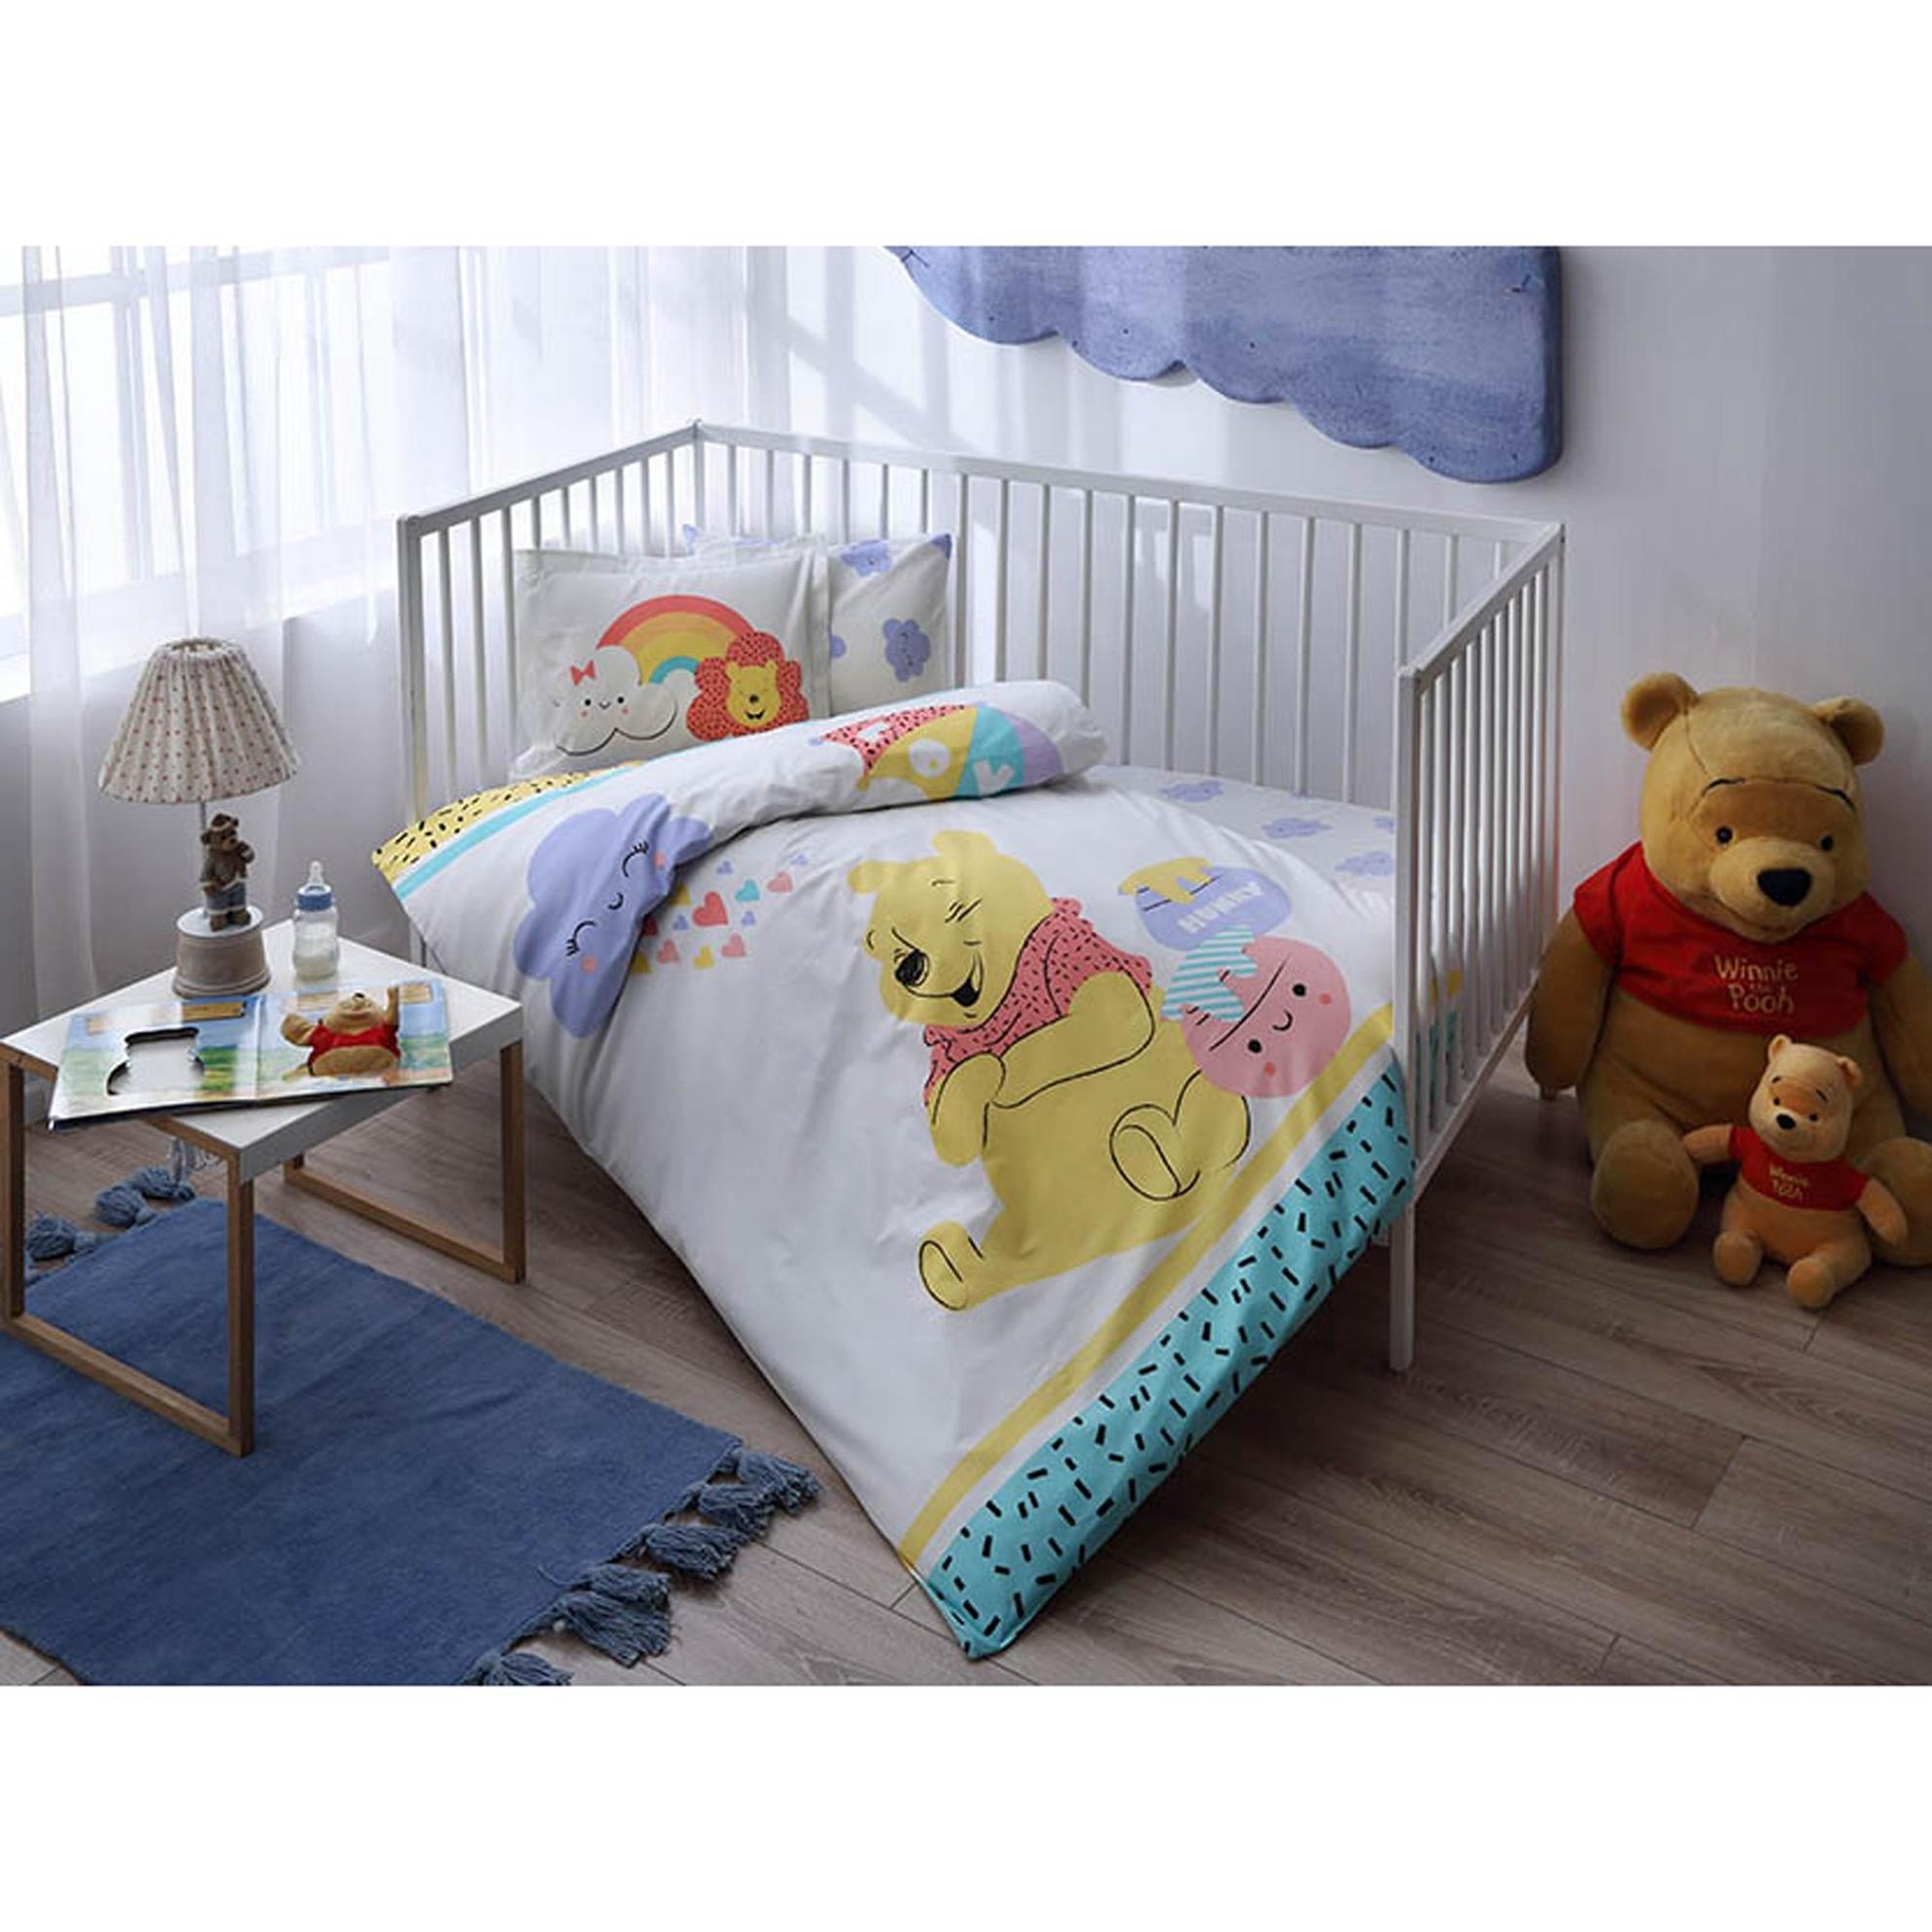 resm Taç Winnie The Pooh Hunny Baby Nevresim Takımı